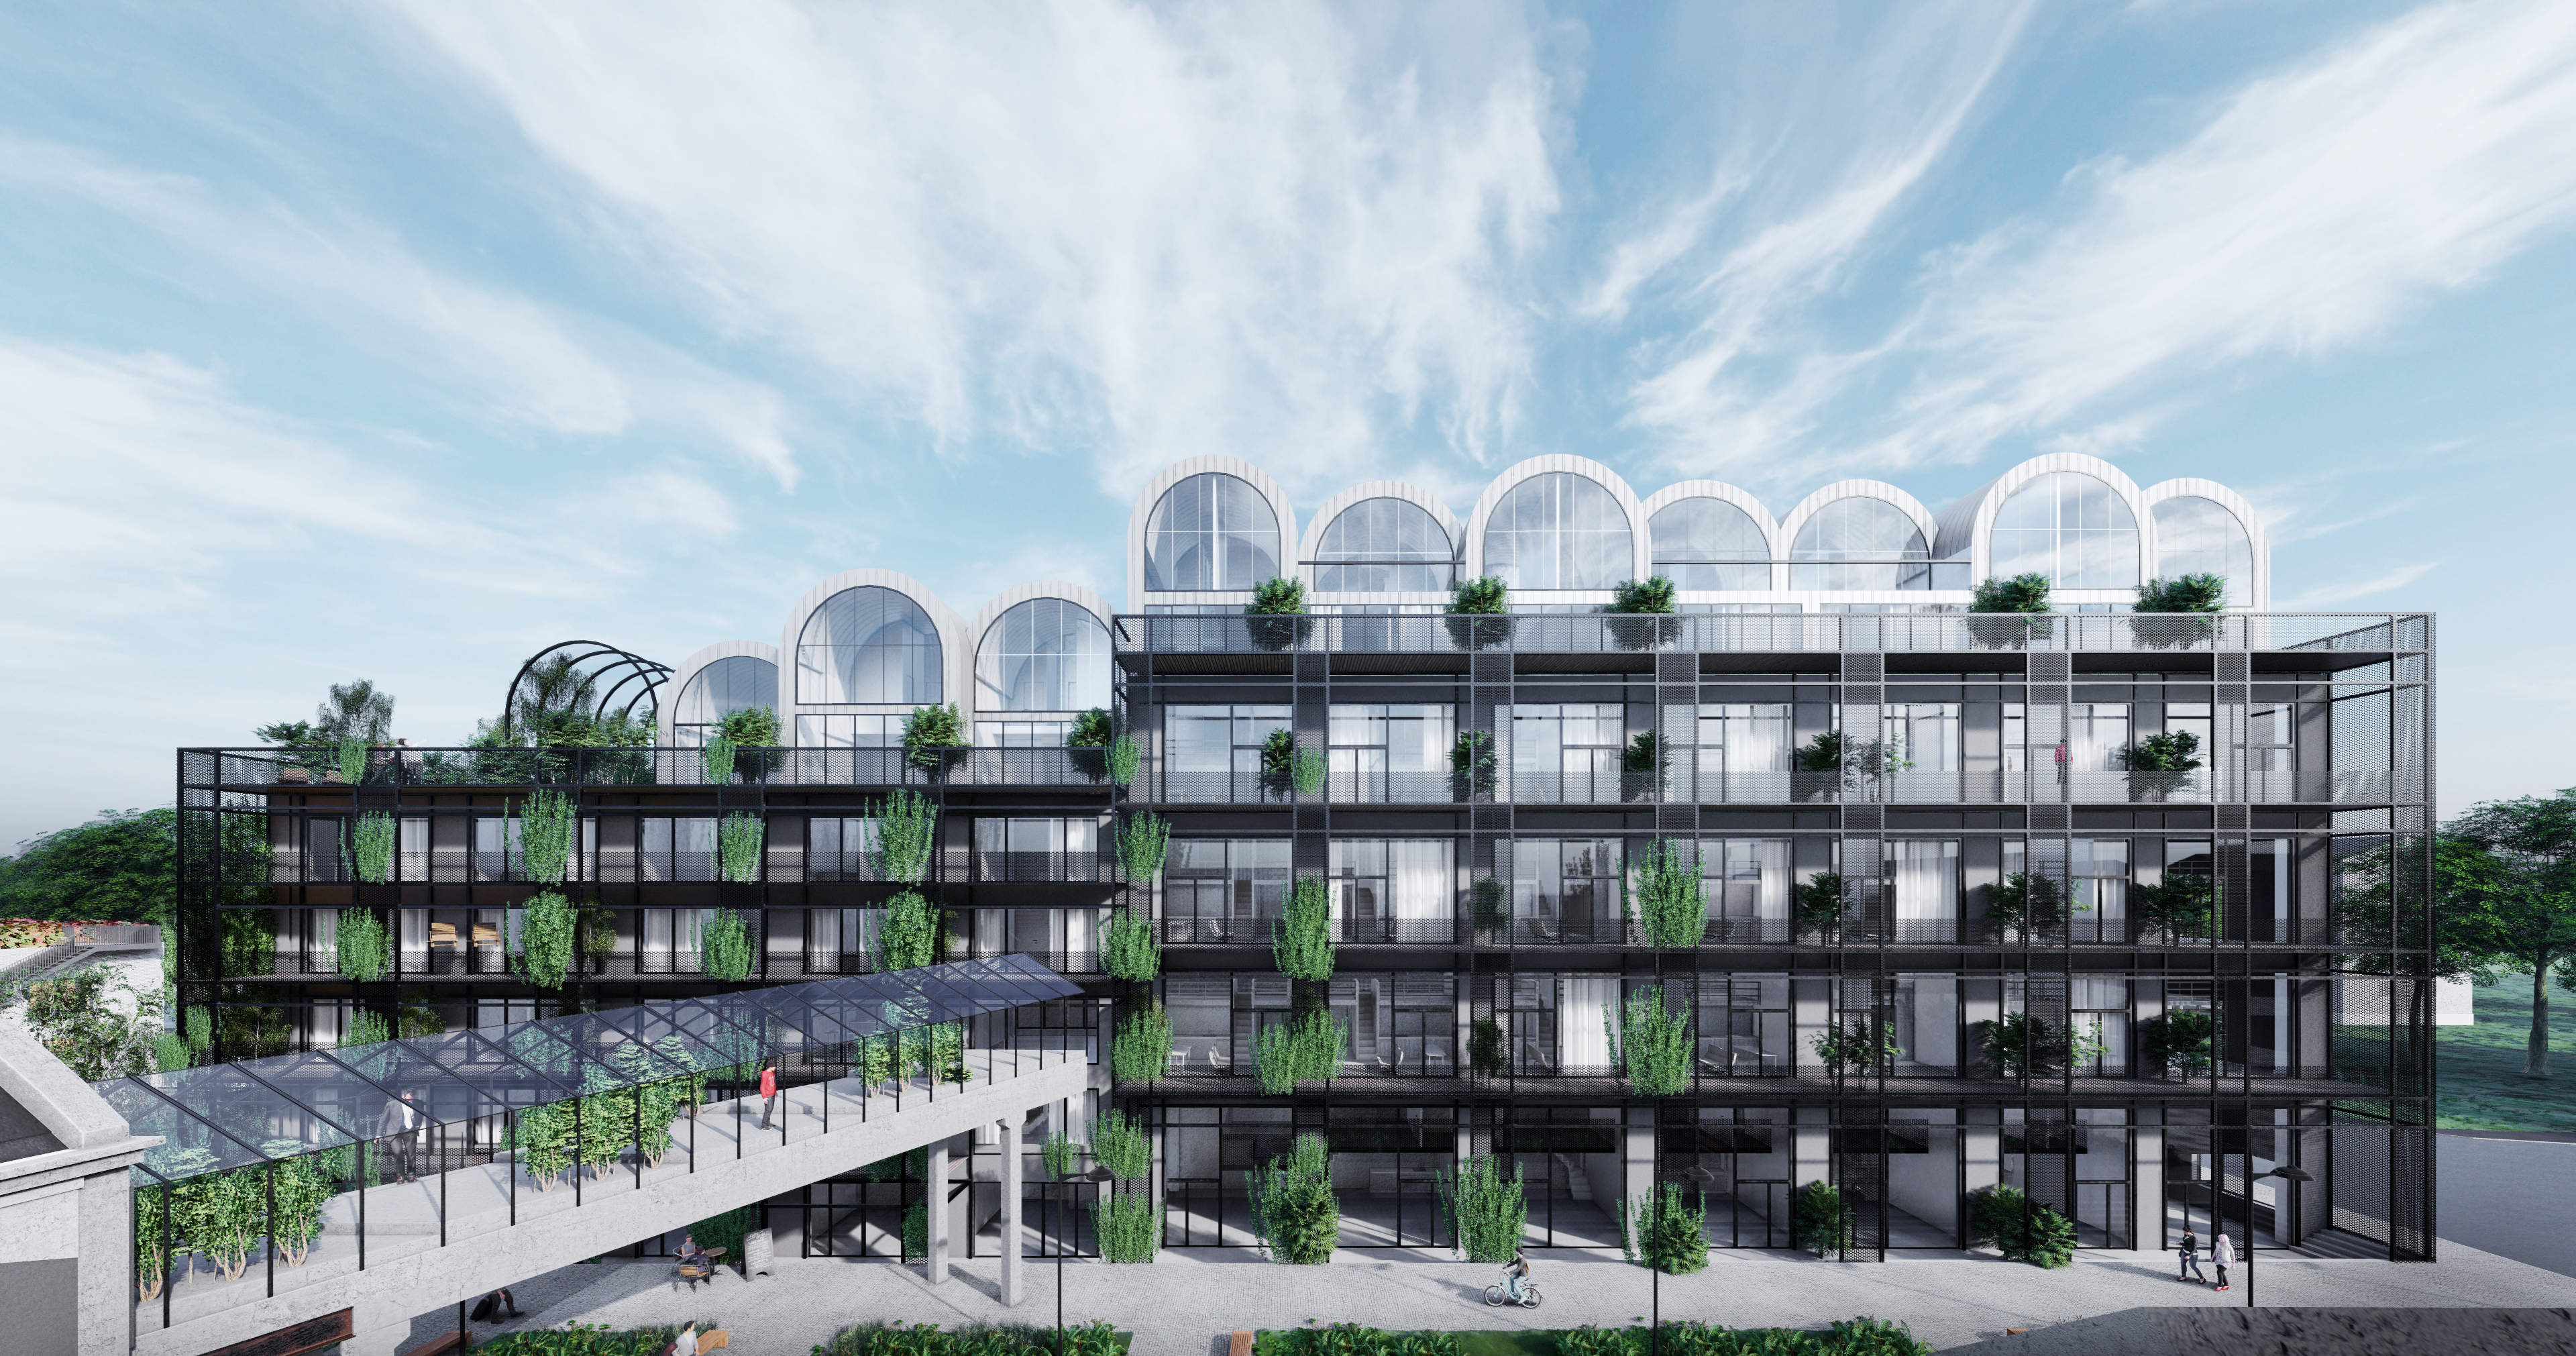 2020 Ankru Building at Põhjala Factory